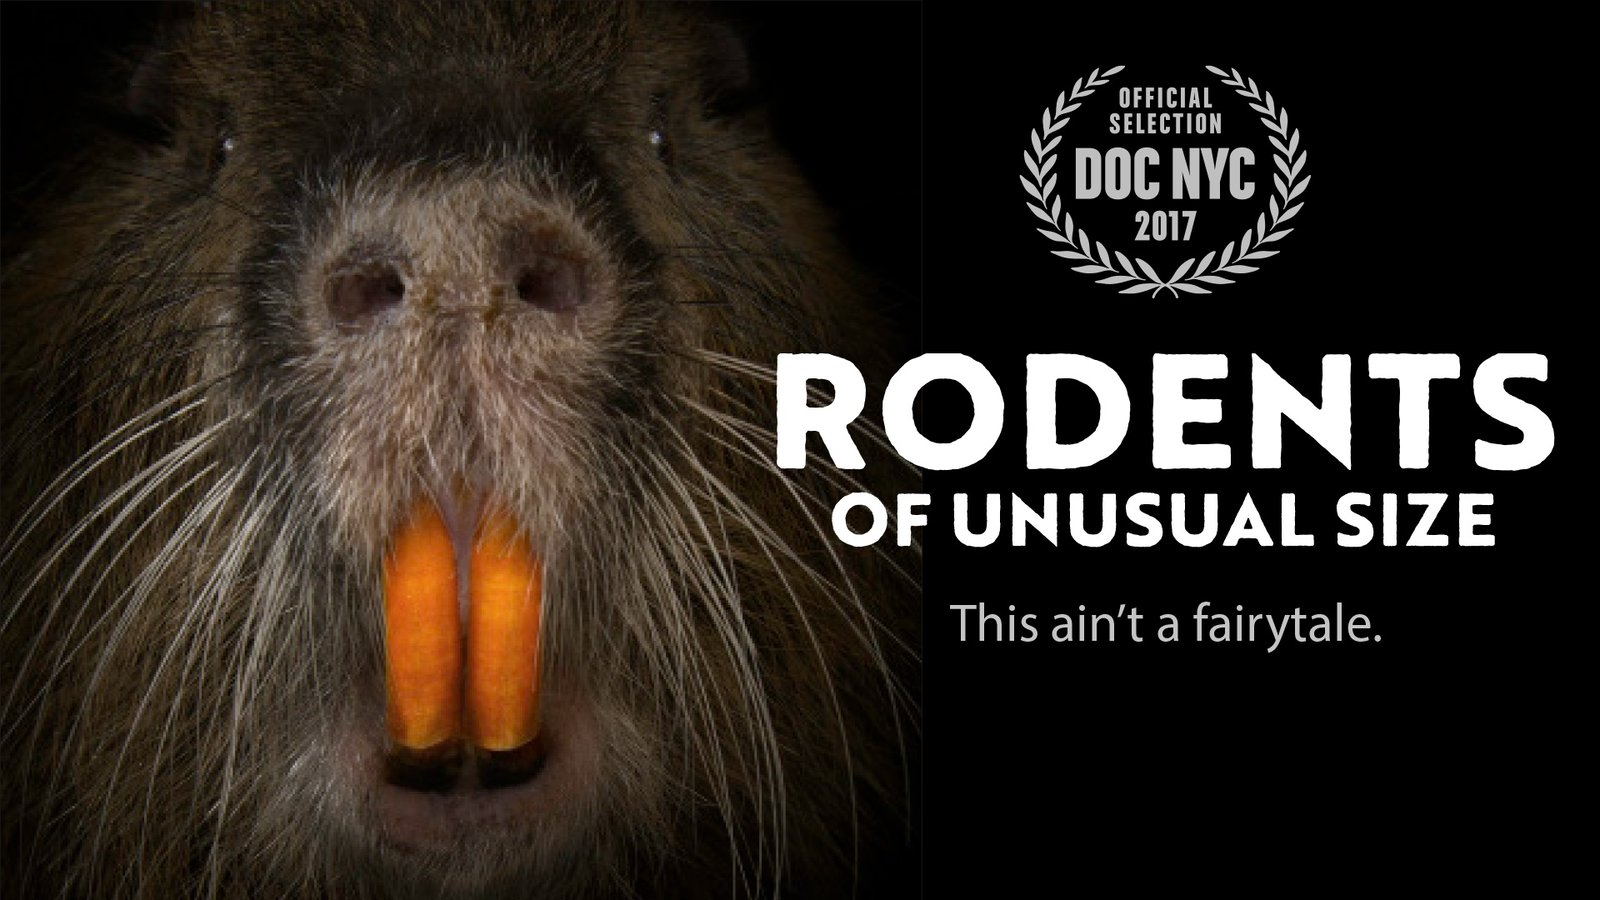 Rodents of Unusual Size - Giant Swamp Rats Invading Coastal Louisiana